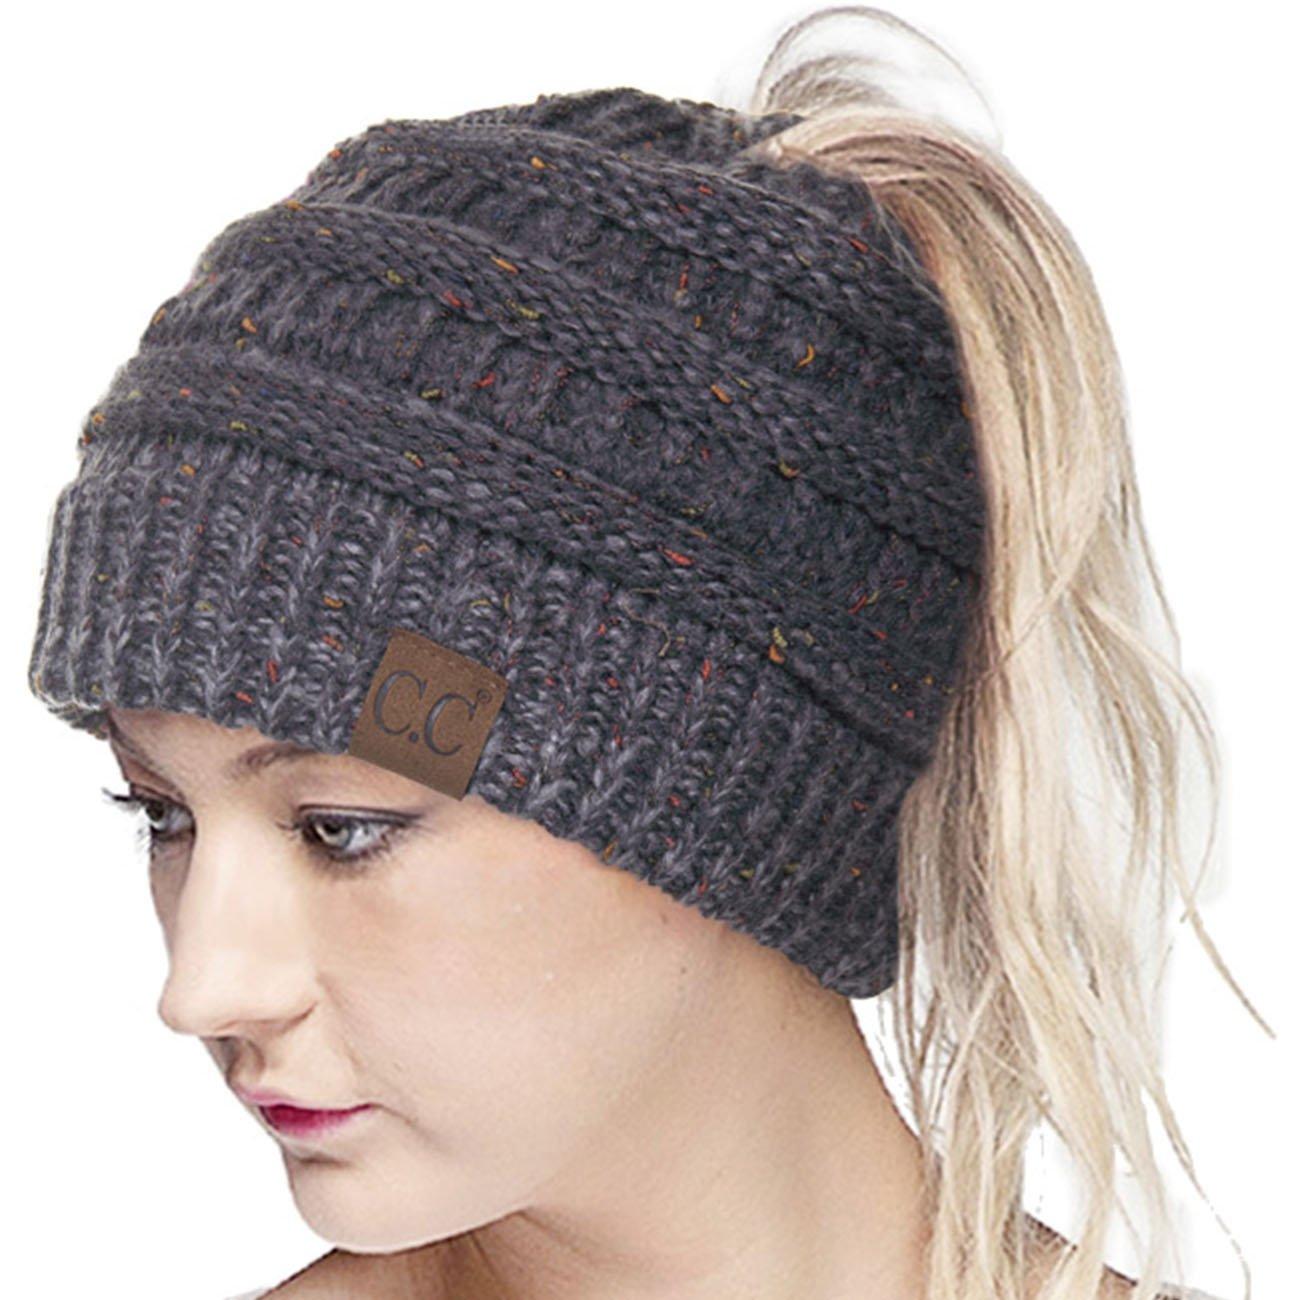 ScarvesMe CC Confetti Ombre Beanietail Ponytail Messy Bun Solid Ribbed Beanie Hat Cap (Dark Melange Grey)